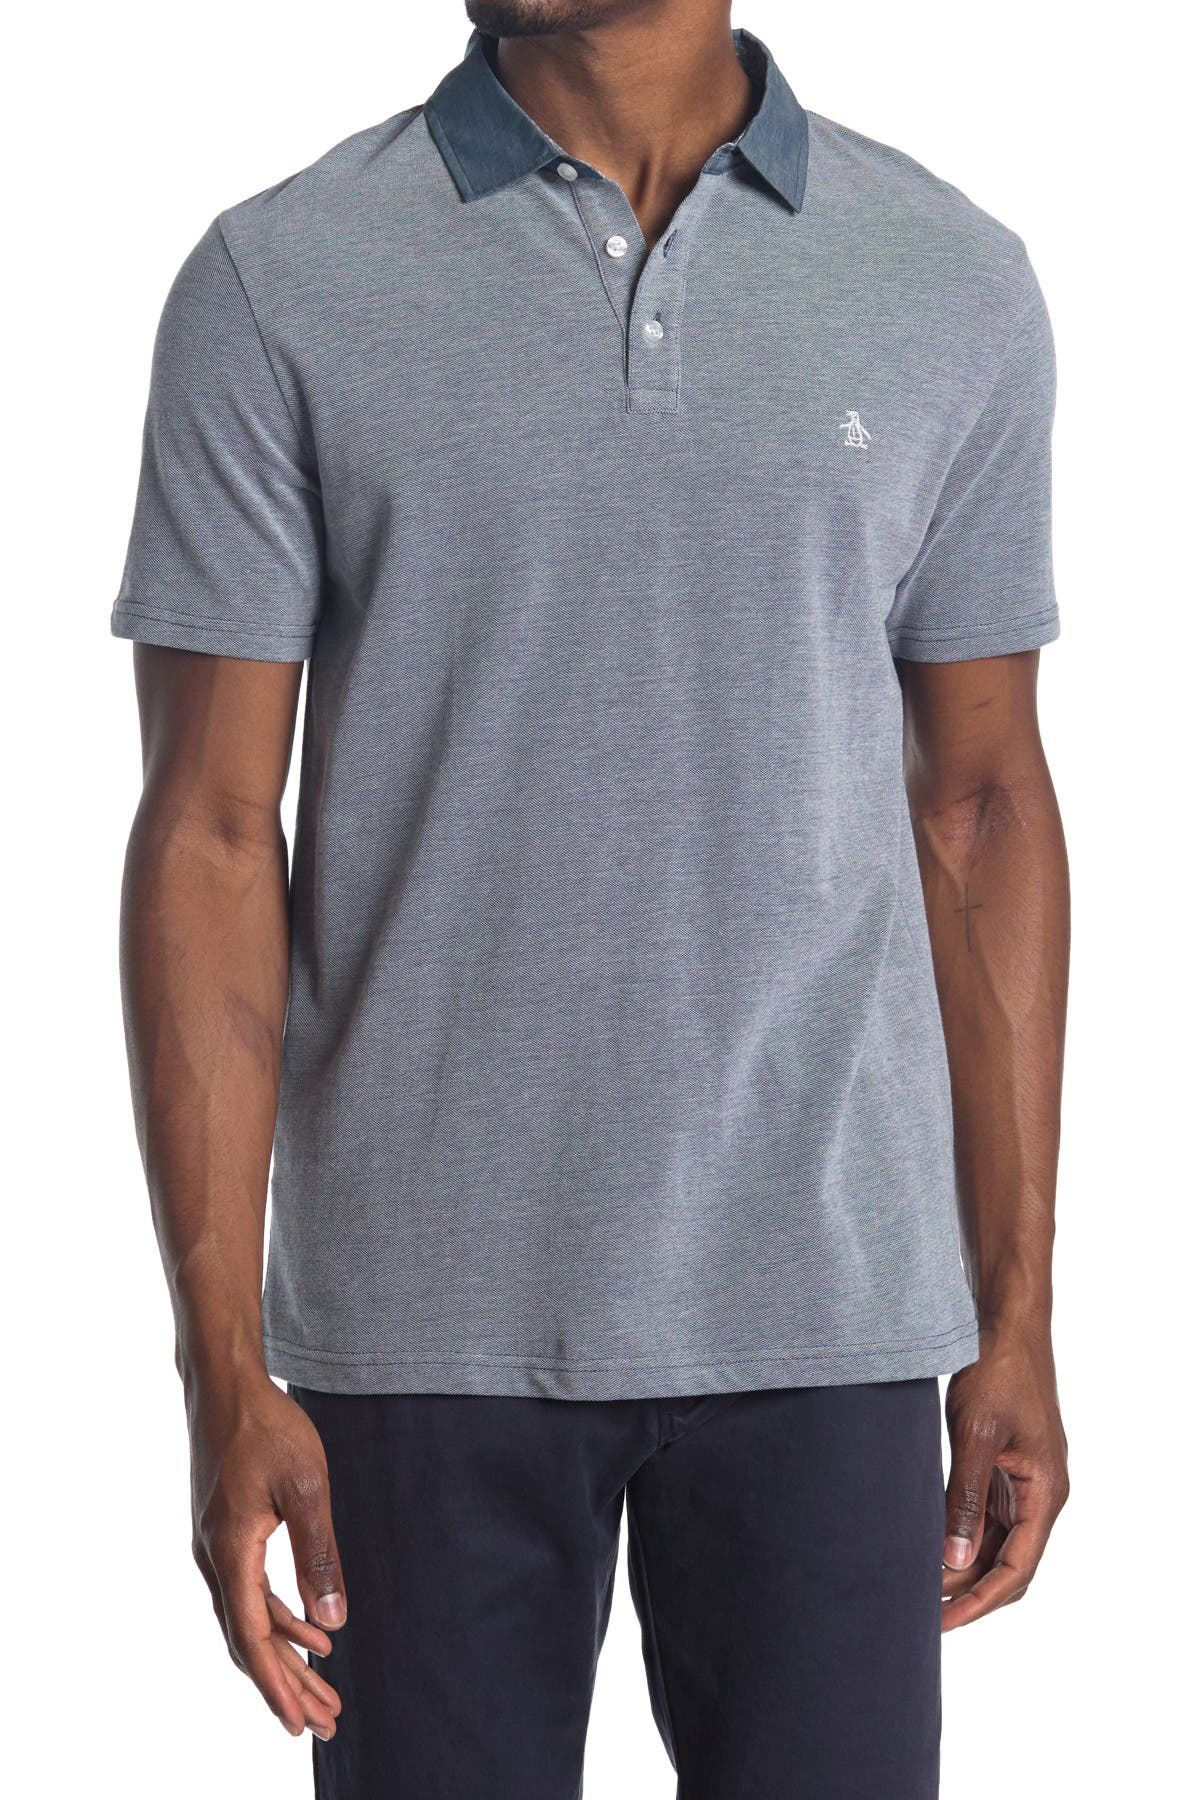 Image of Original Penguin Short Sleeve Birdseye Polo Shirt